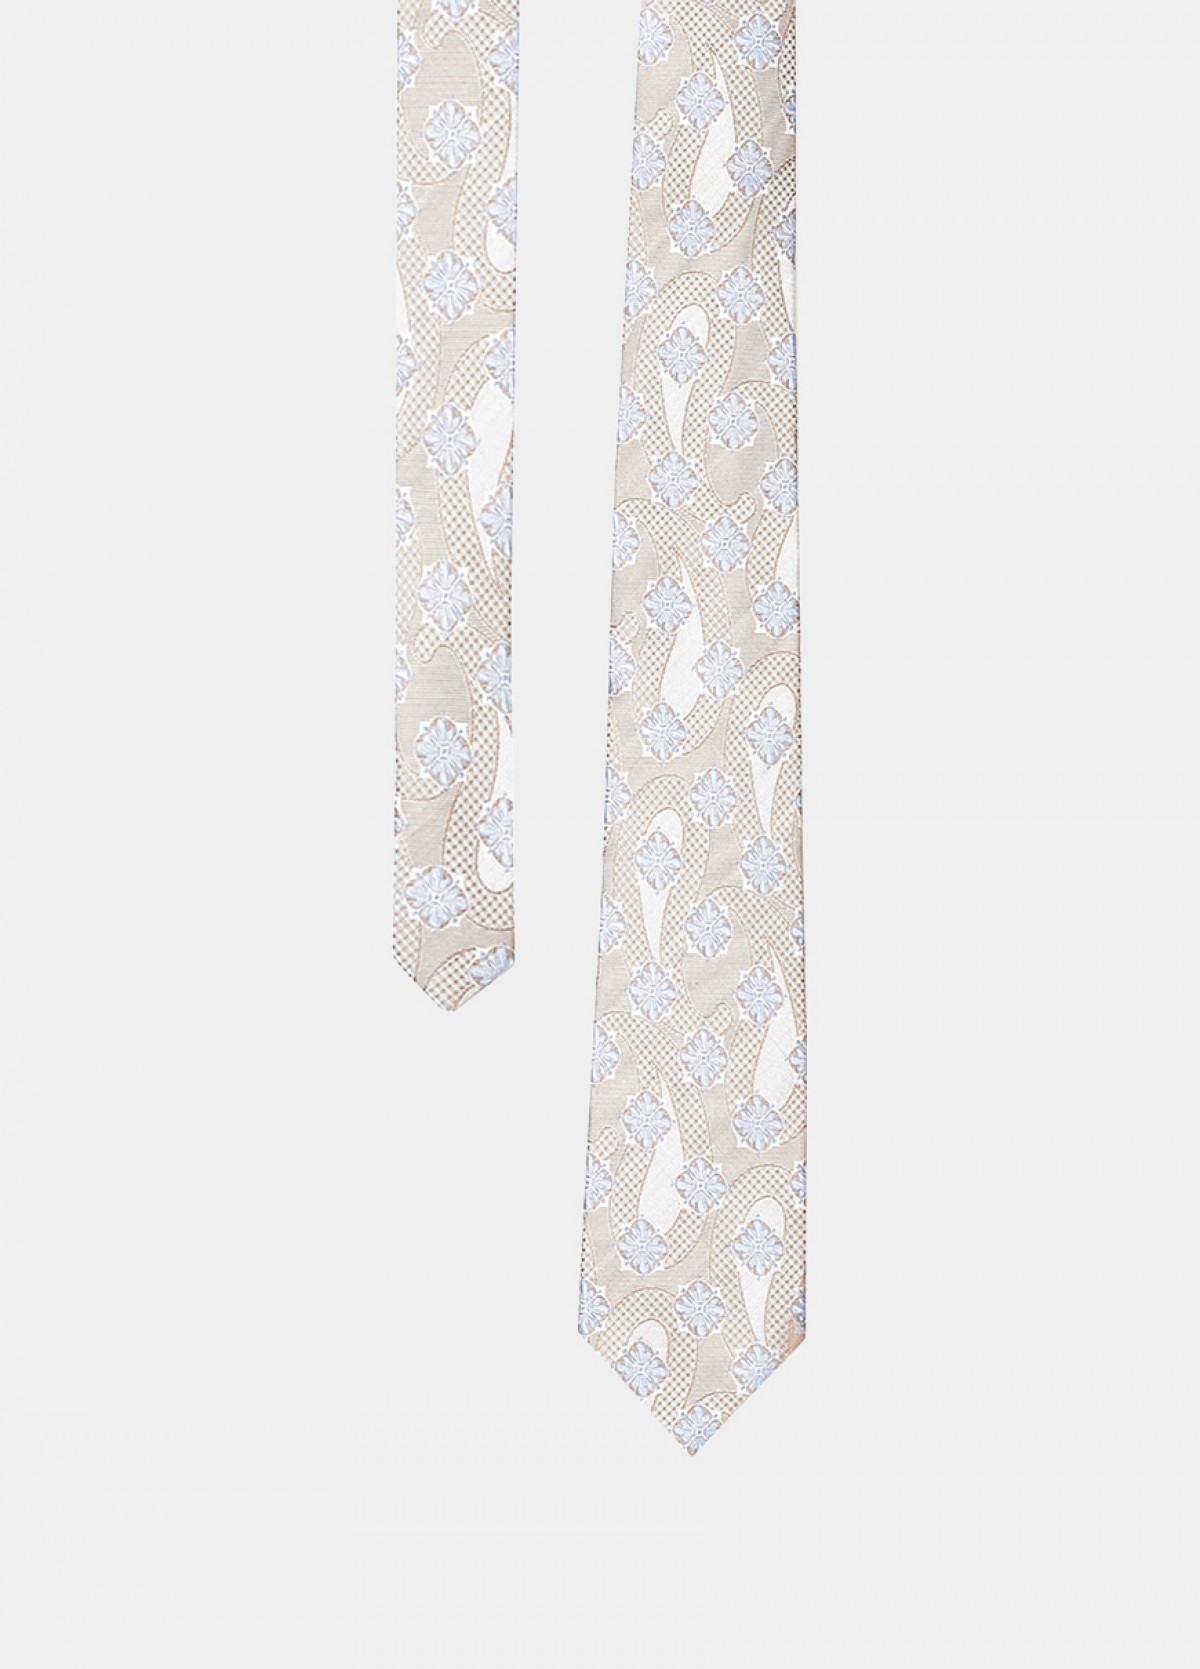 The Cream Stain Resistant Tie